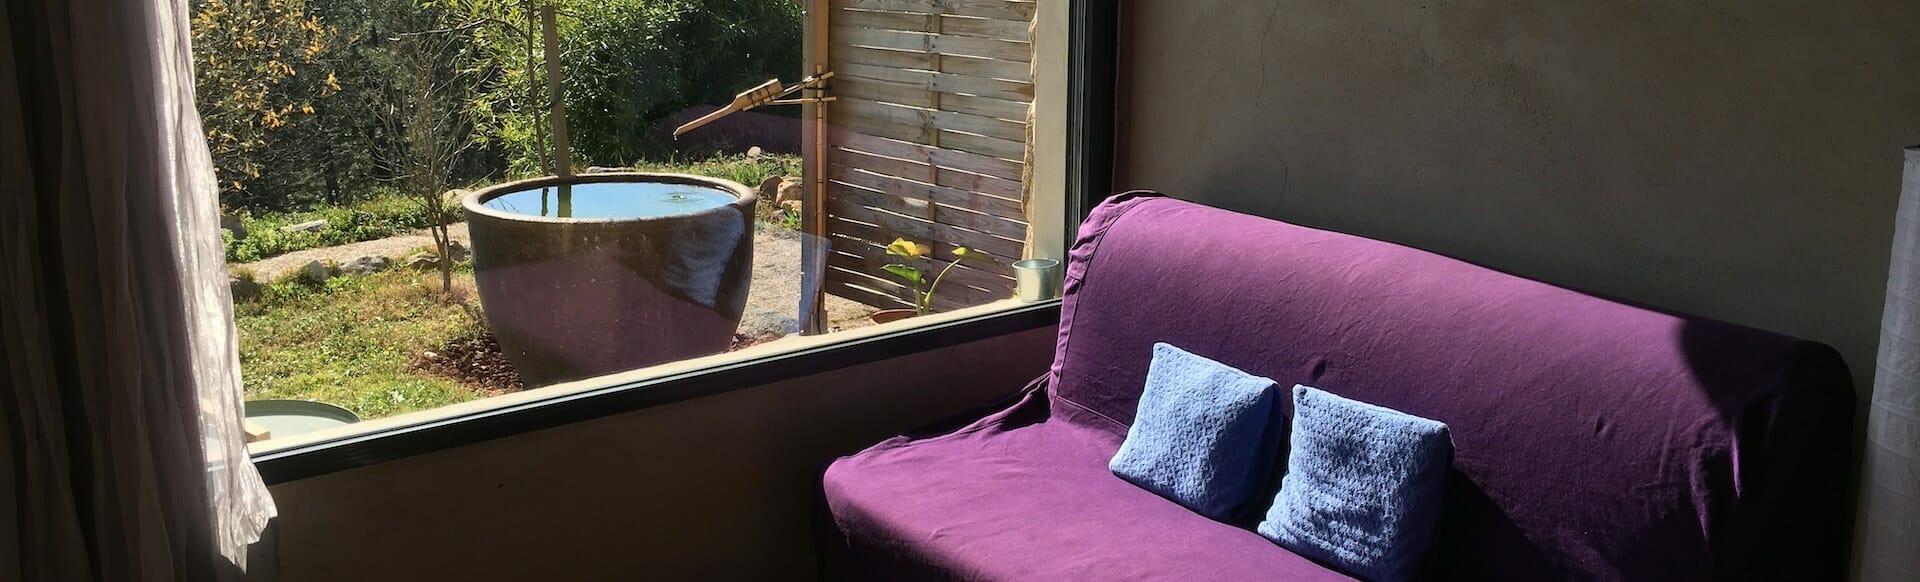 habitacion 2 sofa